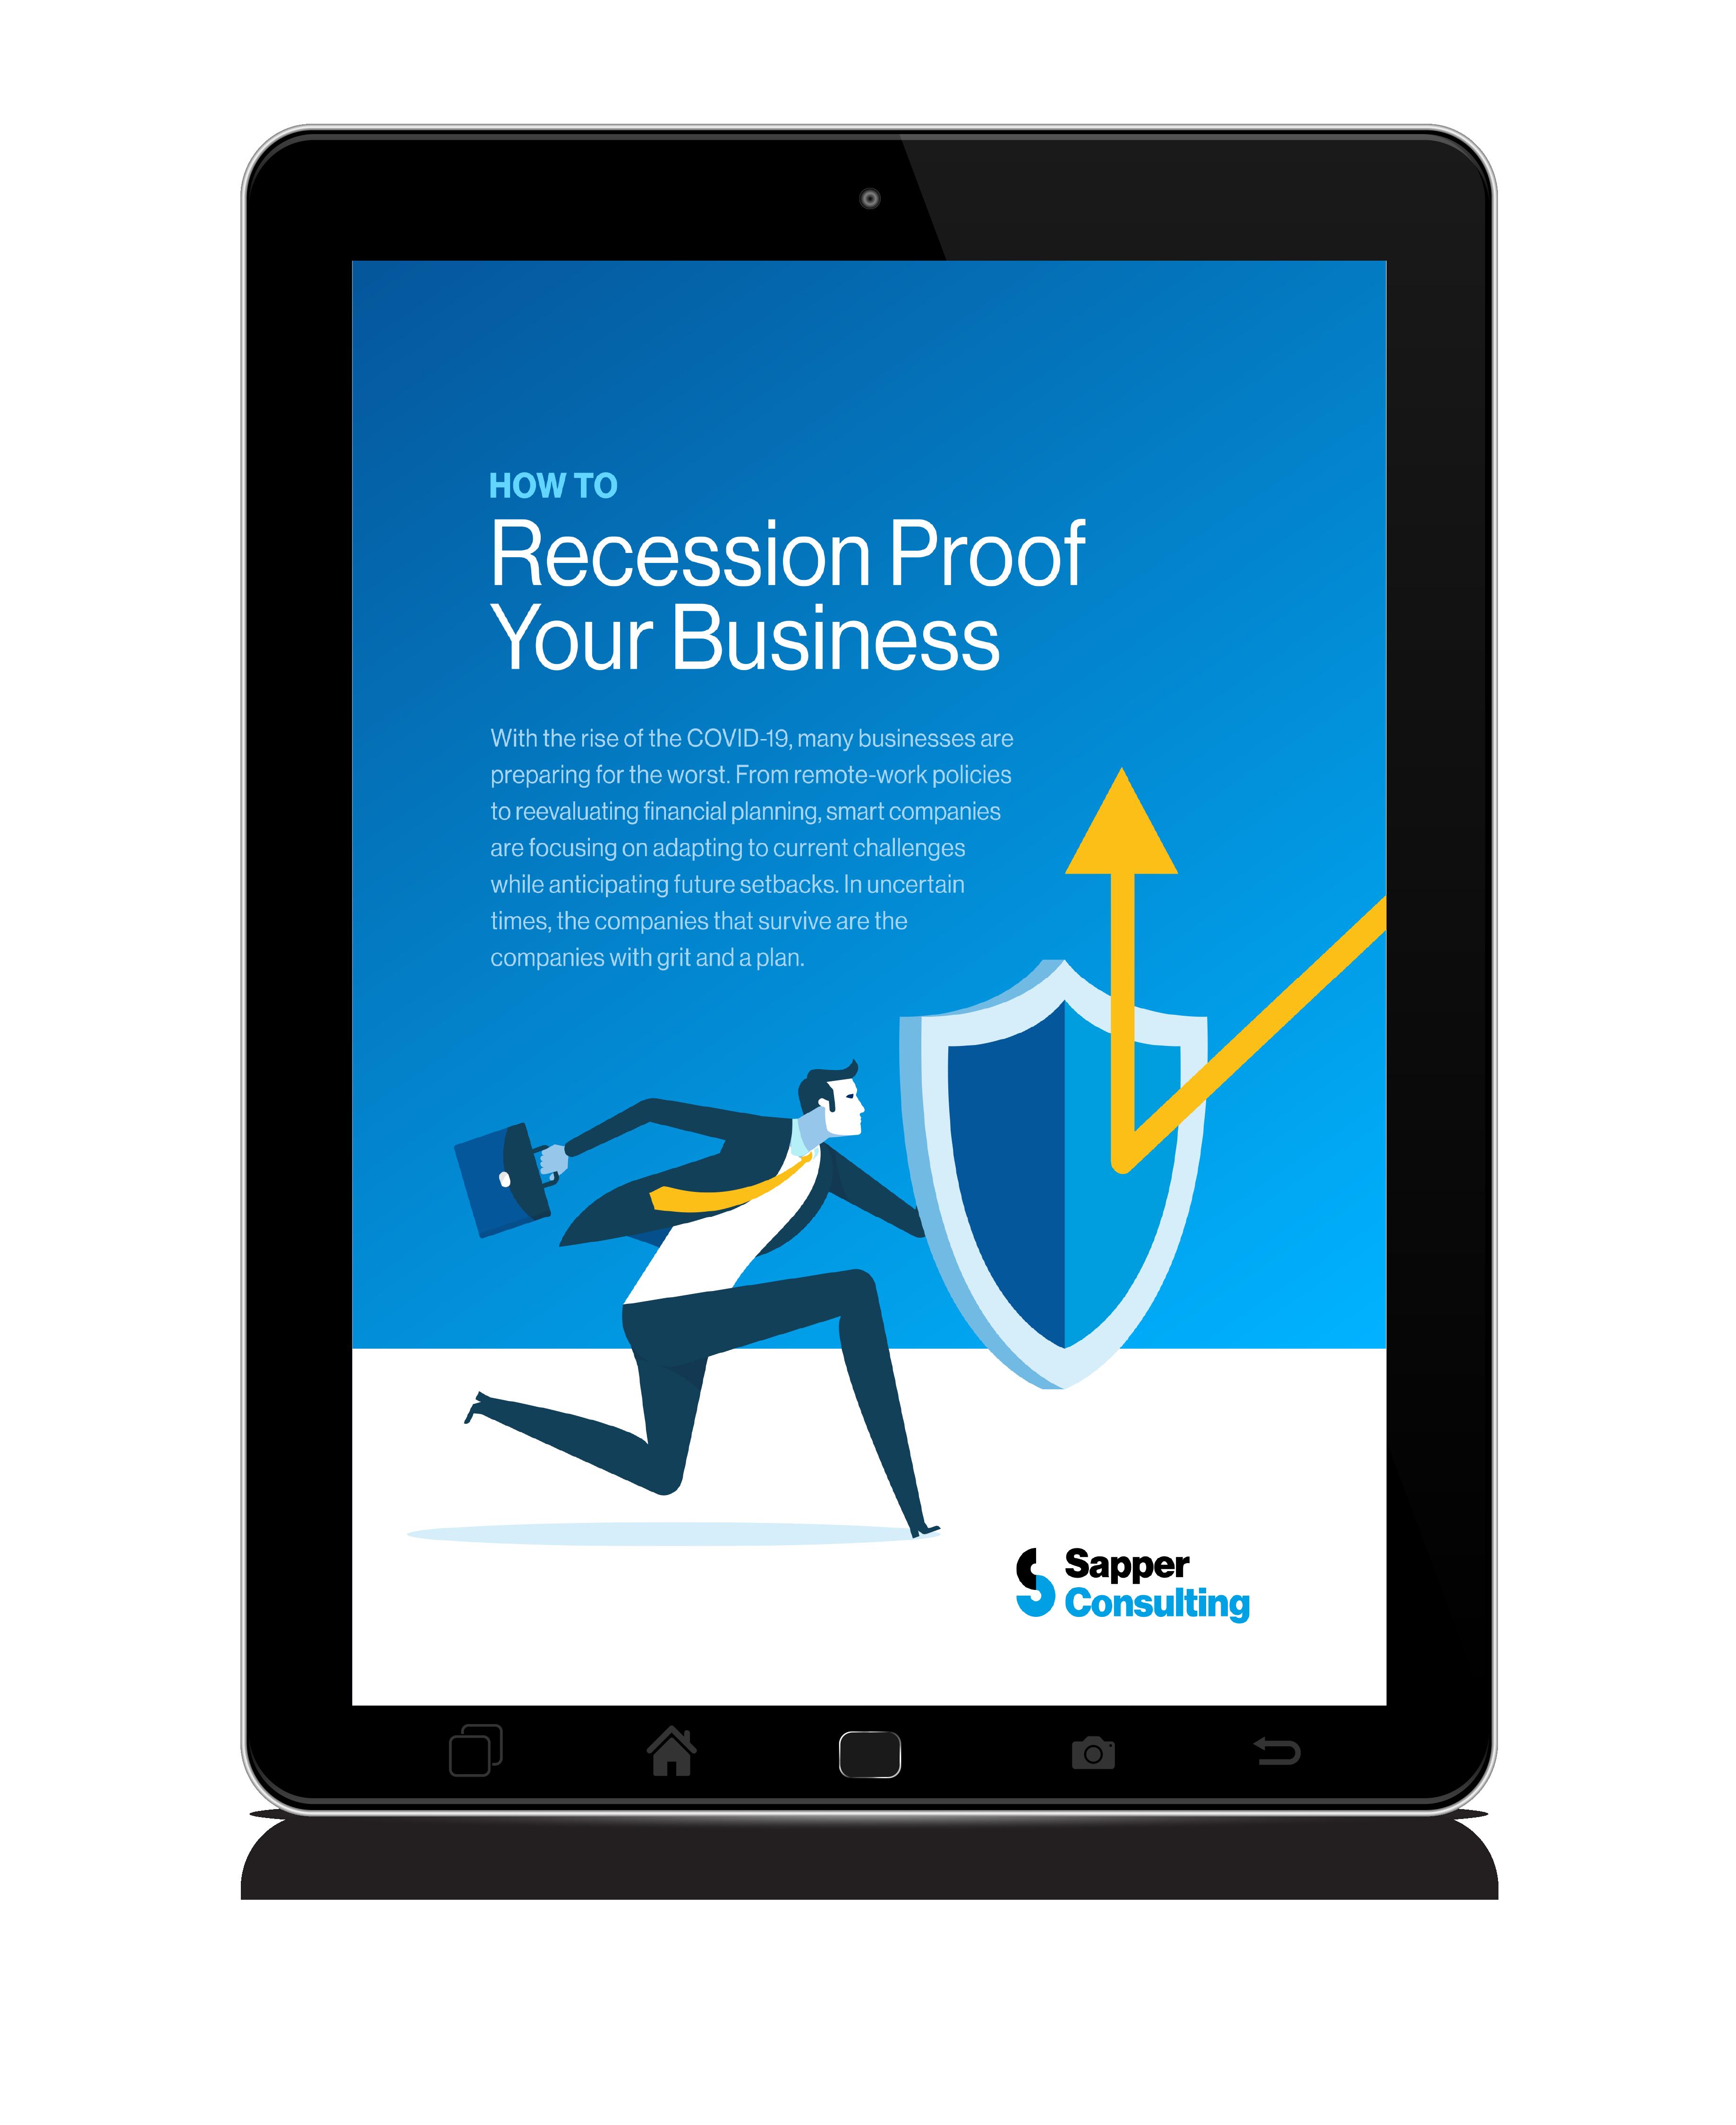 RecessionProof2.0_thumbnail_Plan de travail 1 (1)-1